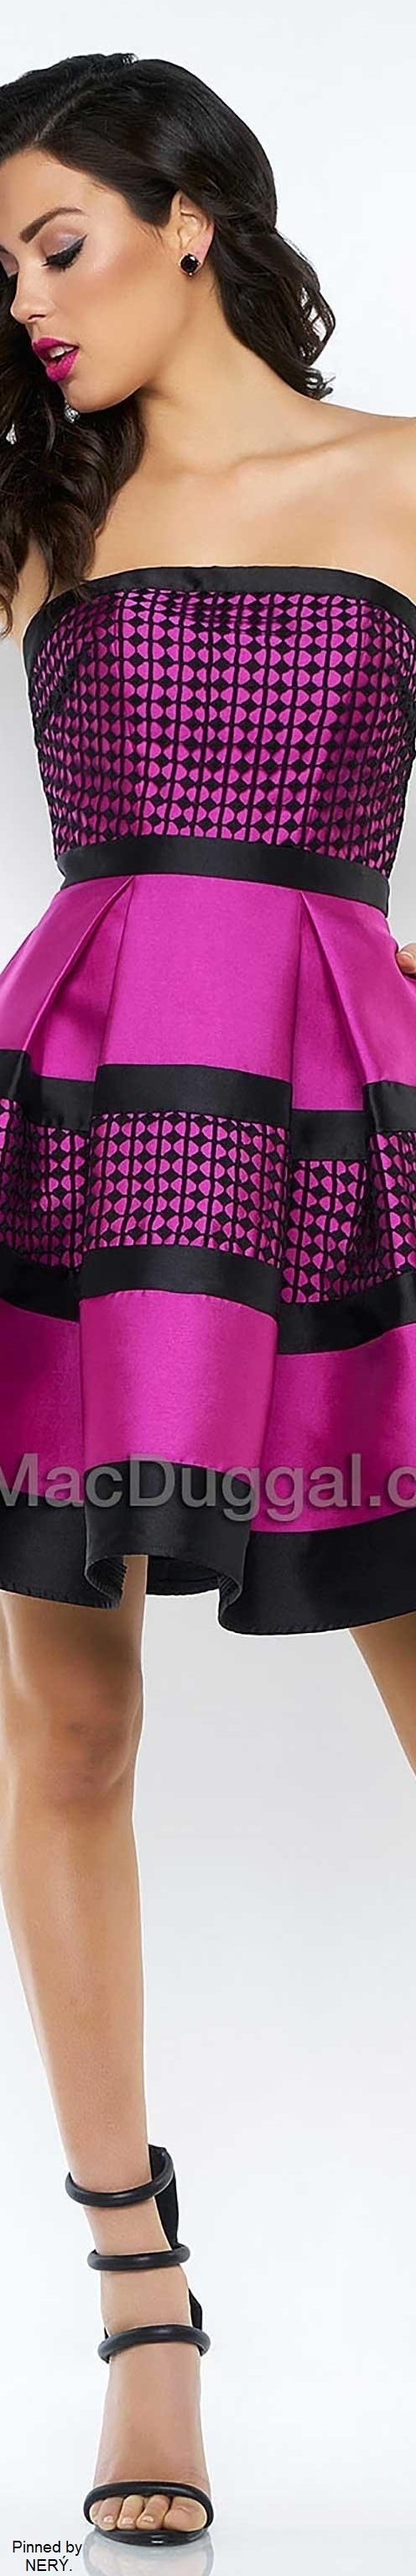 Mac Duggal Prom Dress 2017-MagentaBlack | MacDUGGAL◇▫◇ | Pinterest